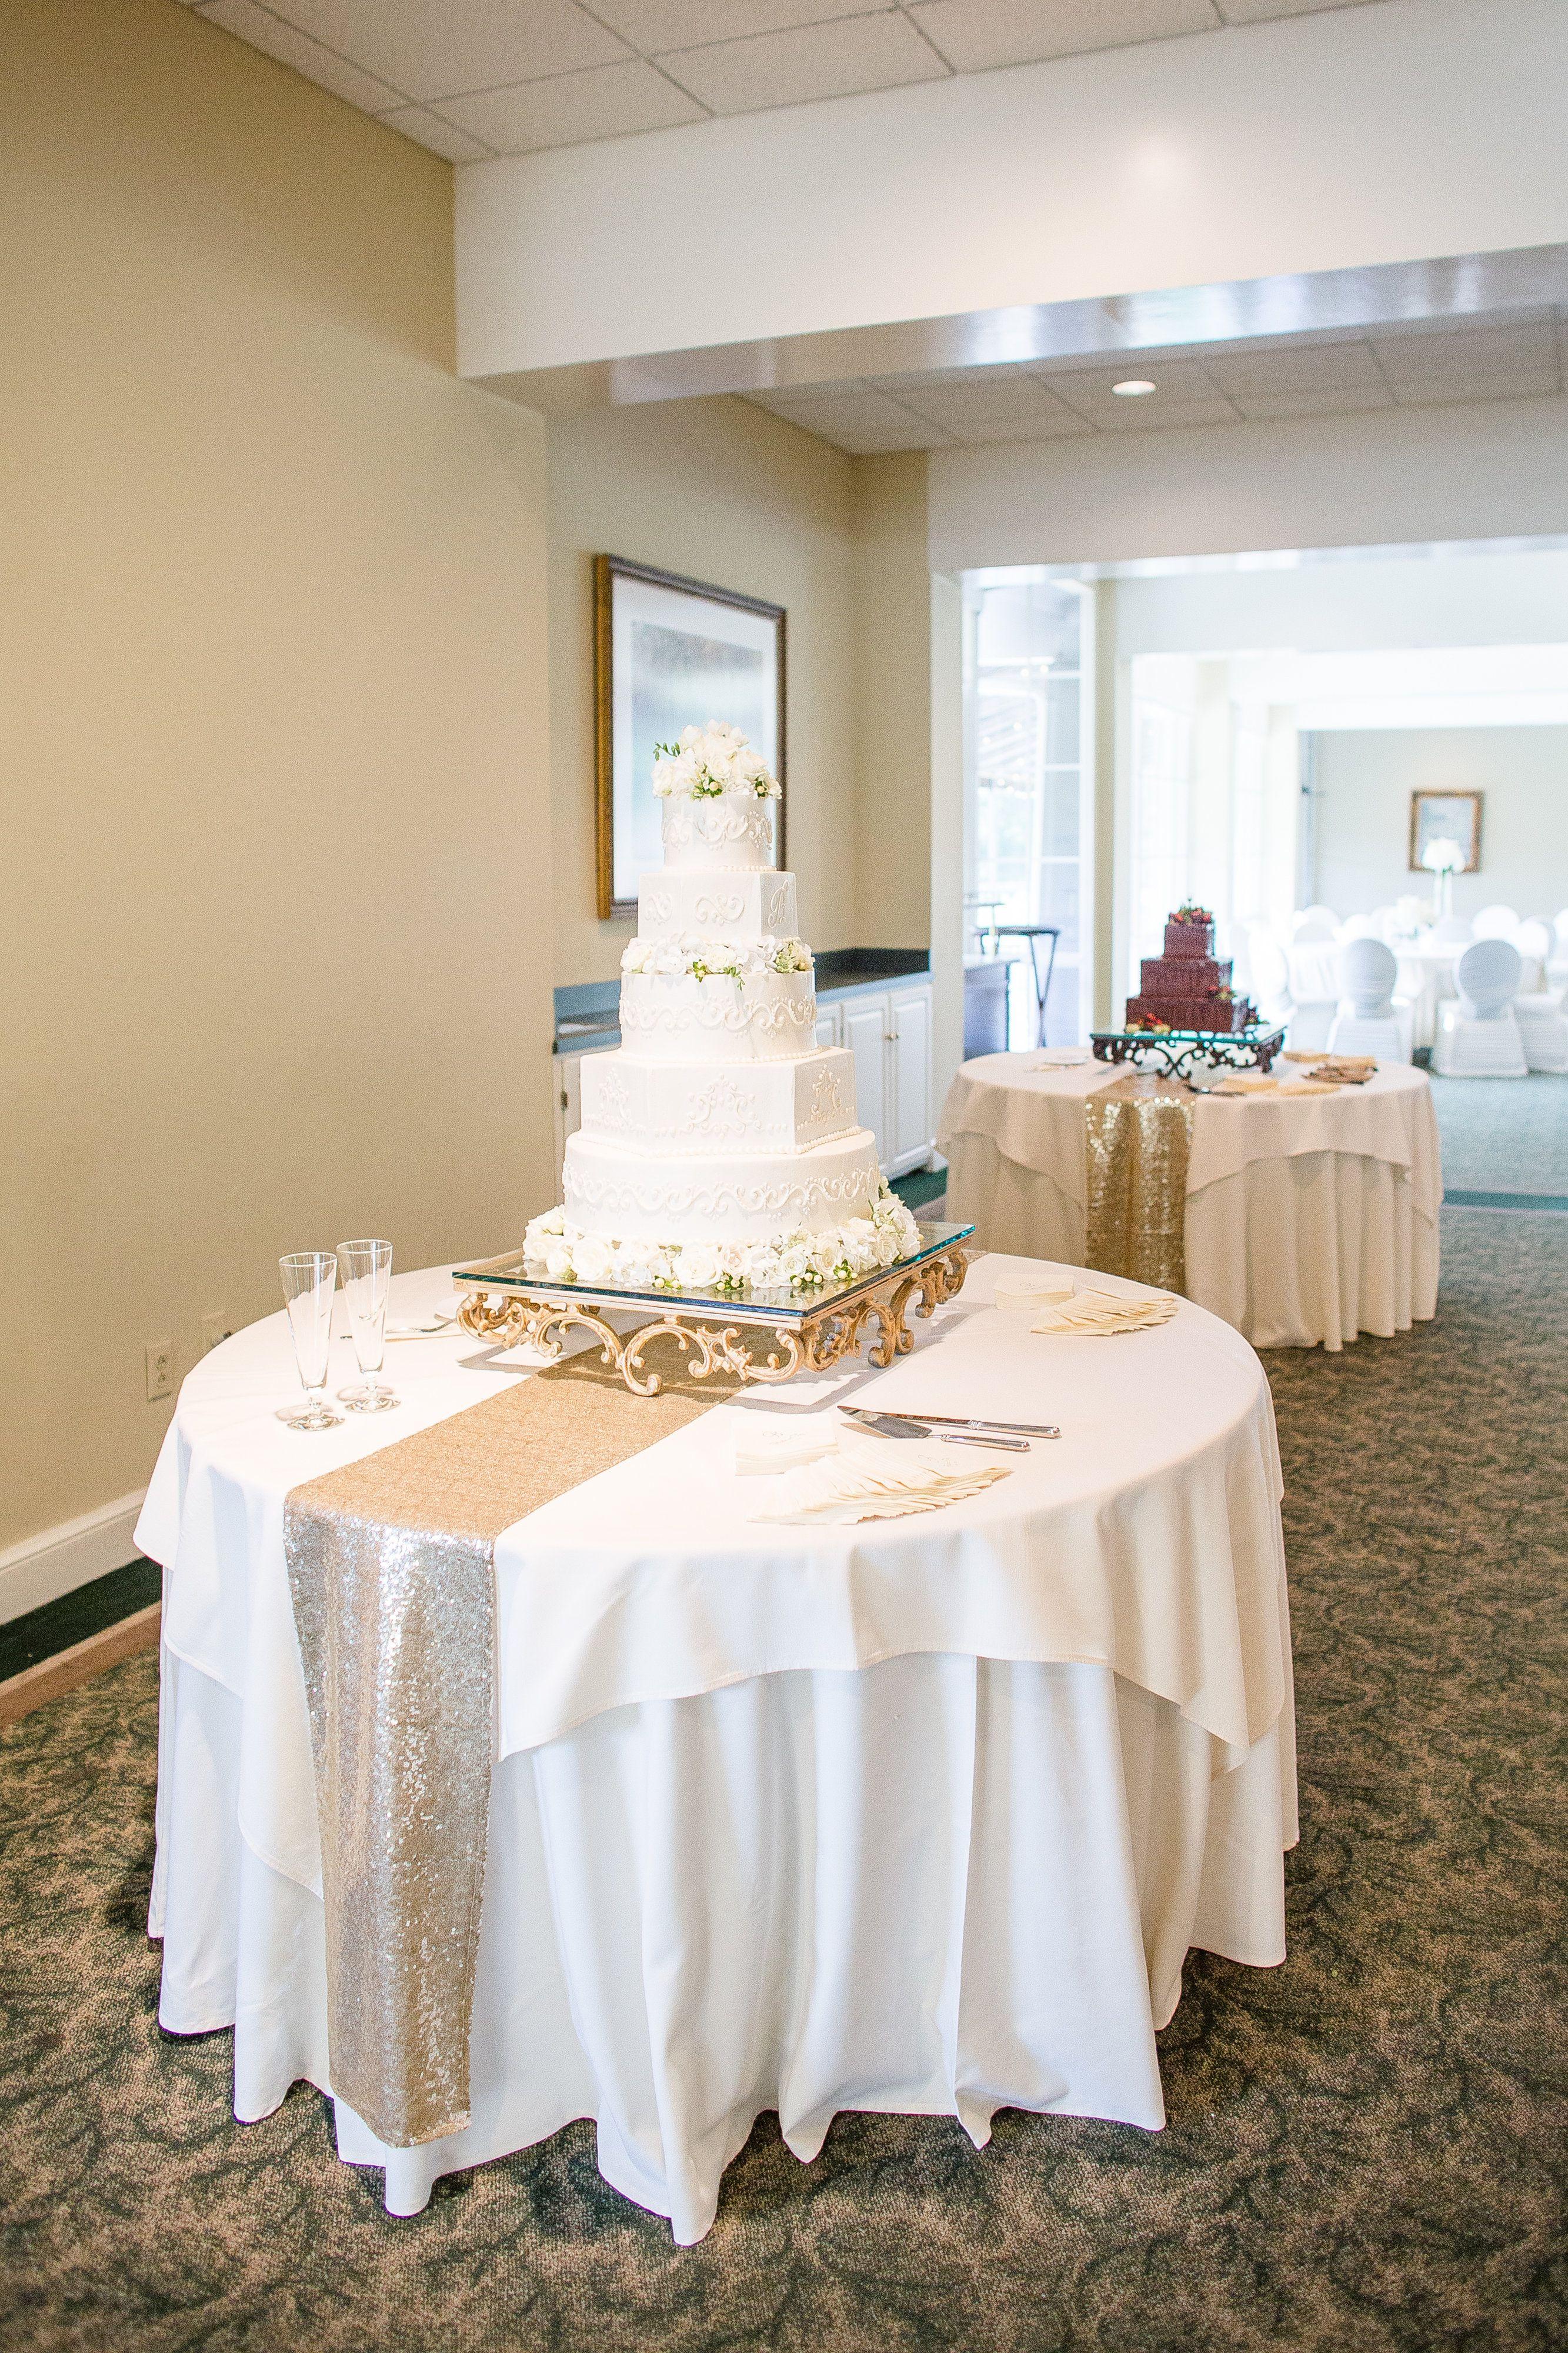 Hoover Country Club Wedding Summer Weddings Main Dining Room Ballroom Cake Table